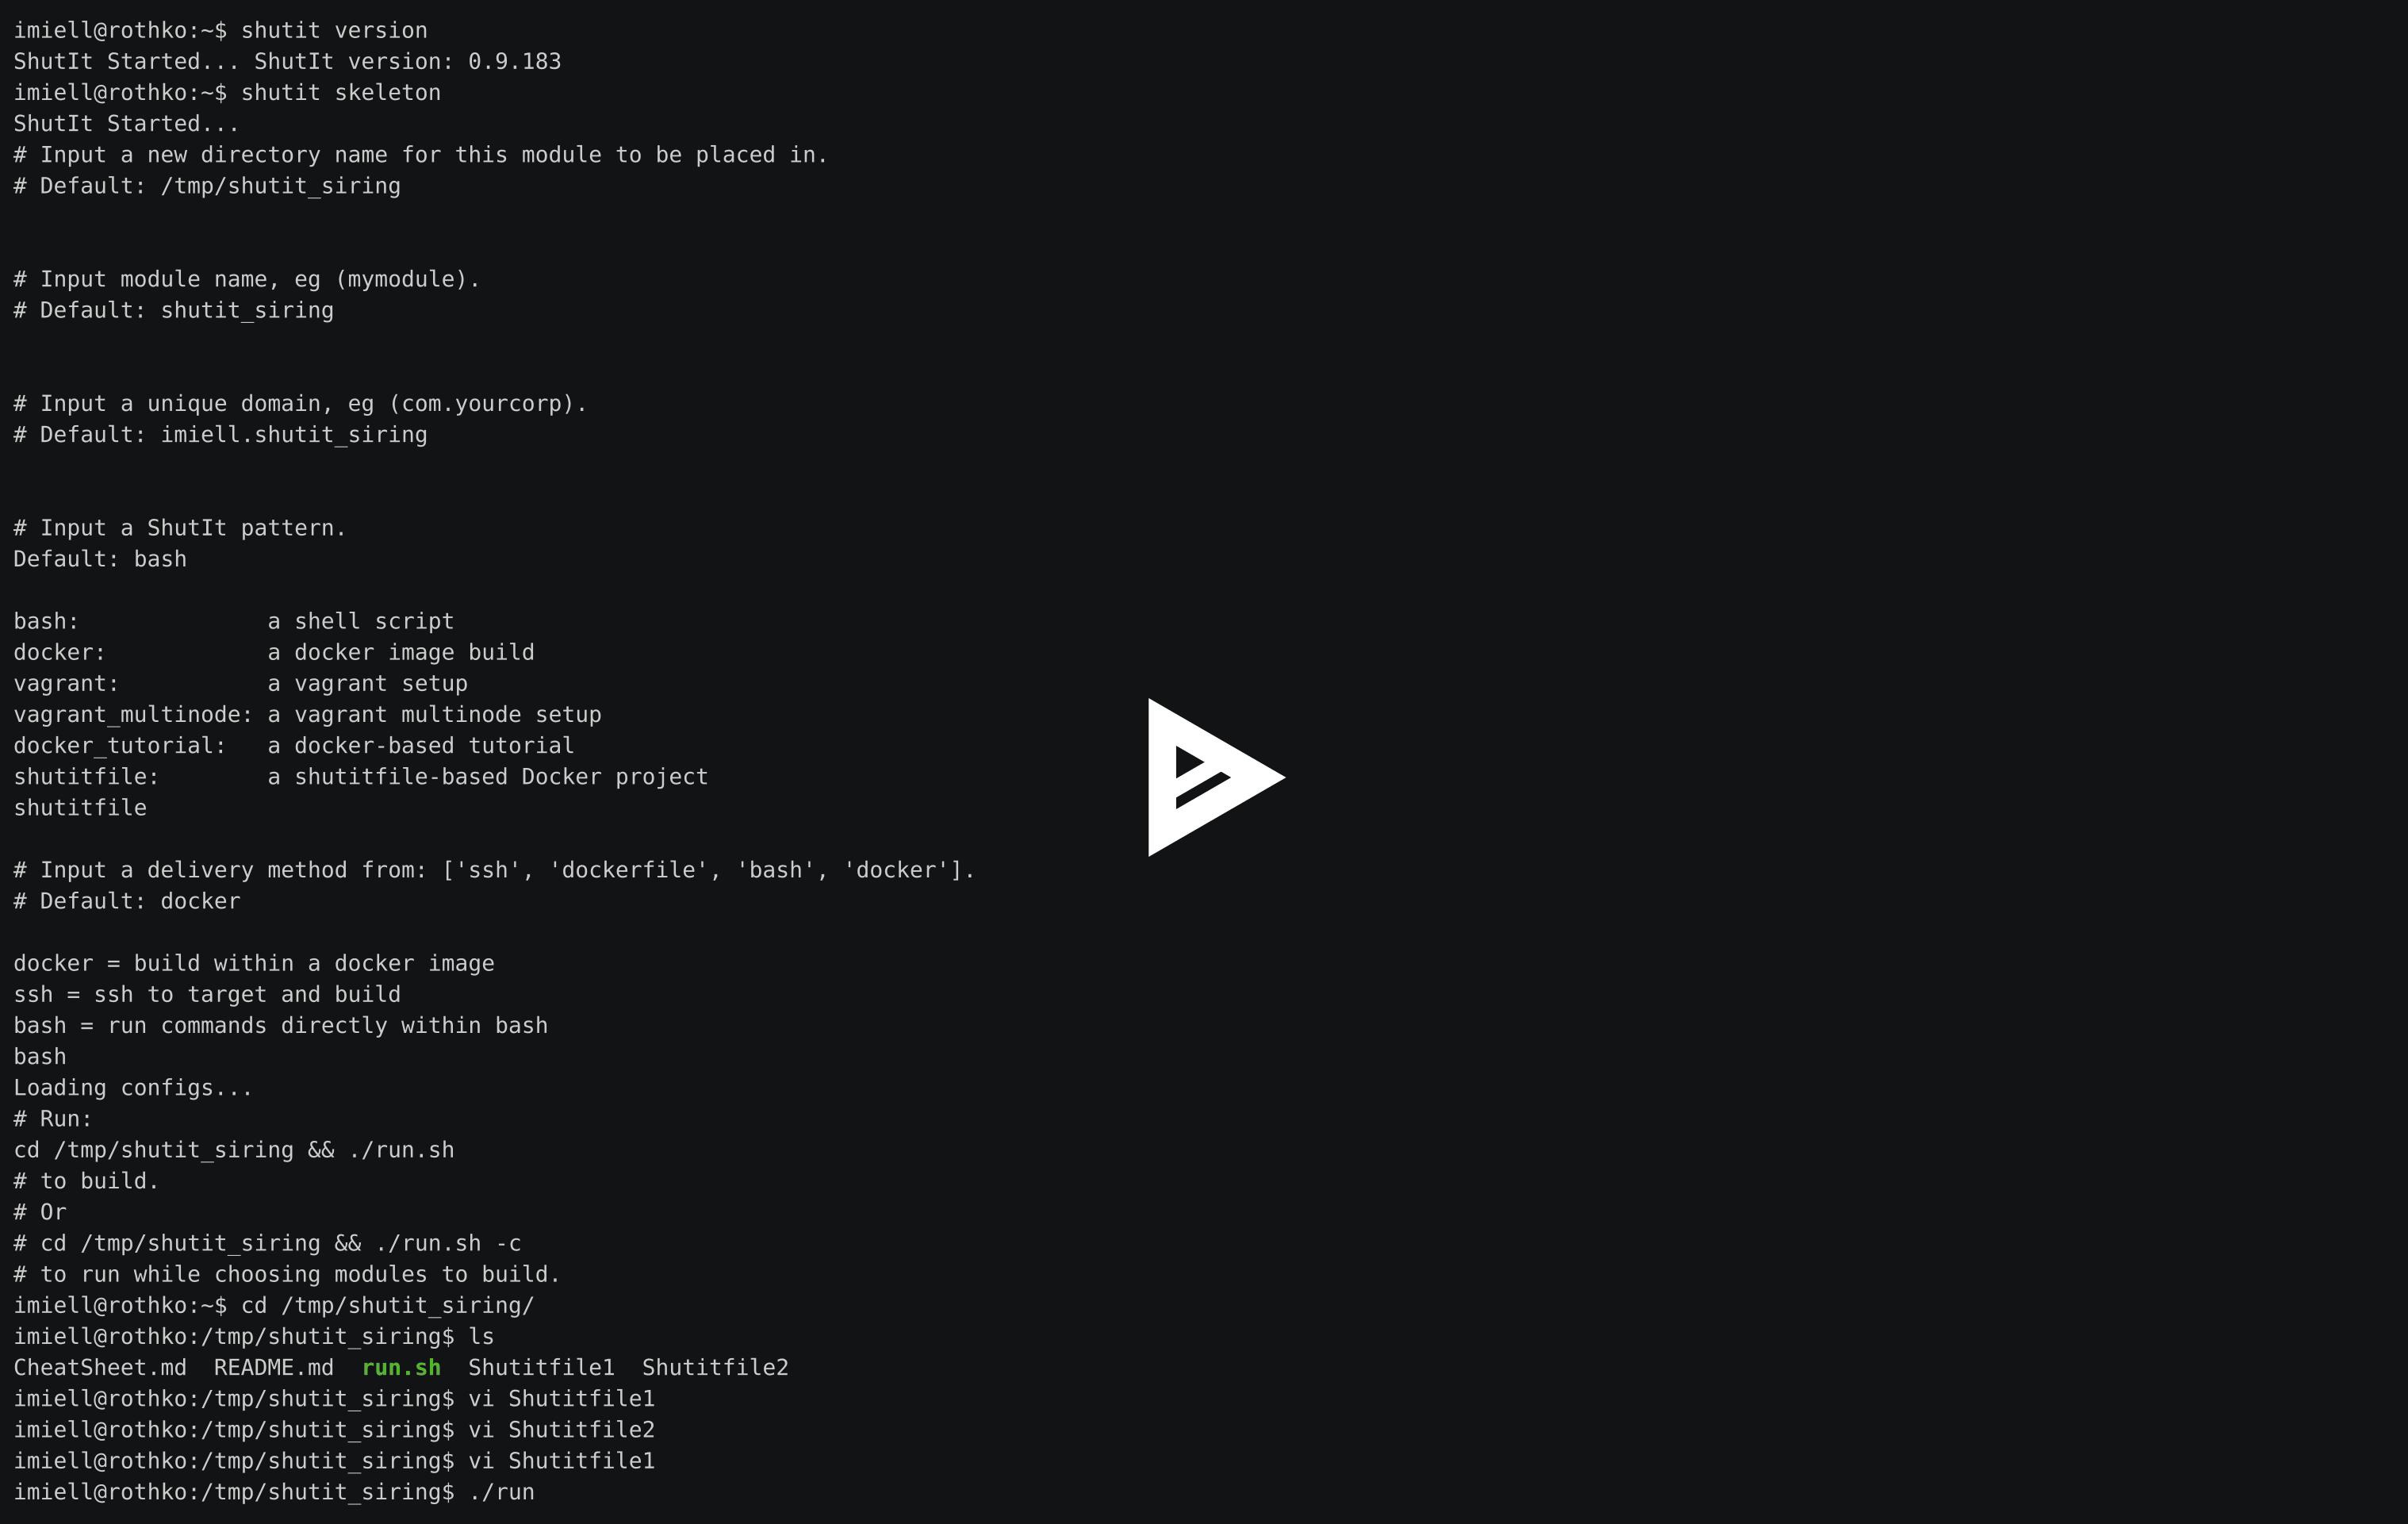 asciicast of above script